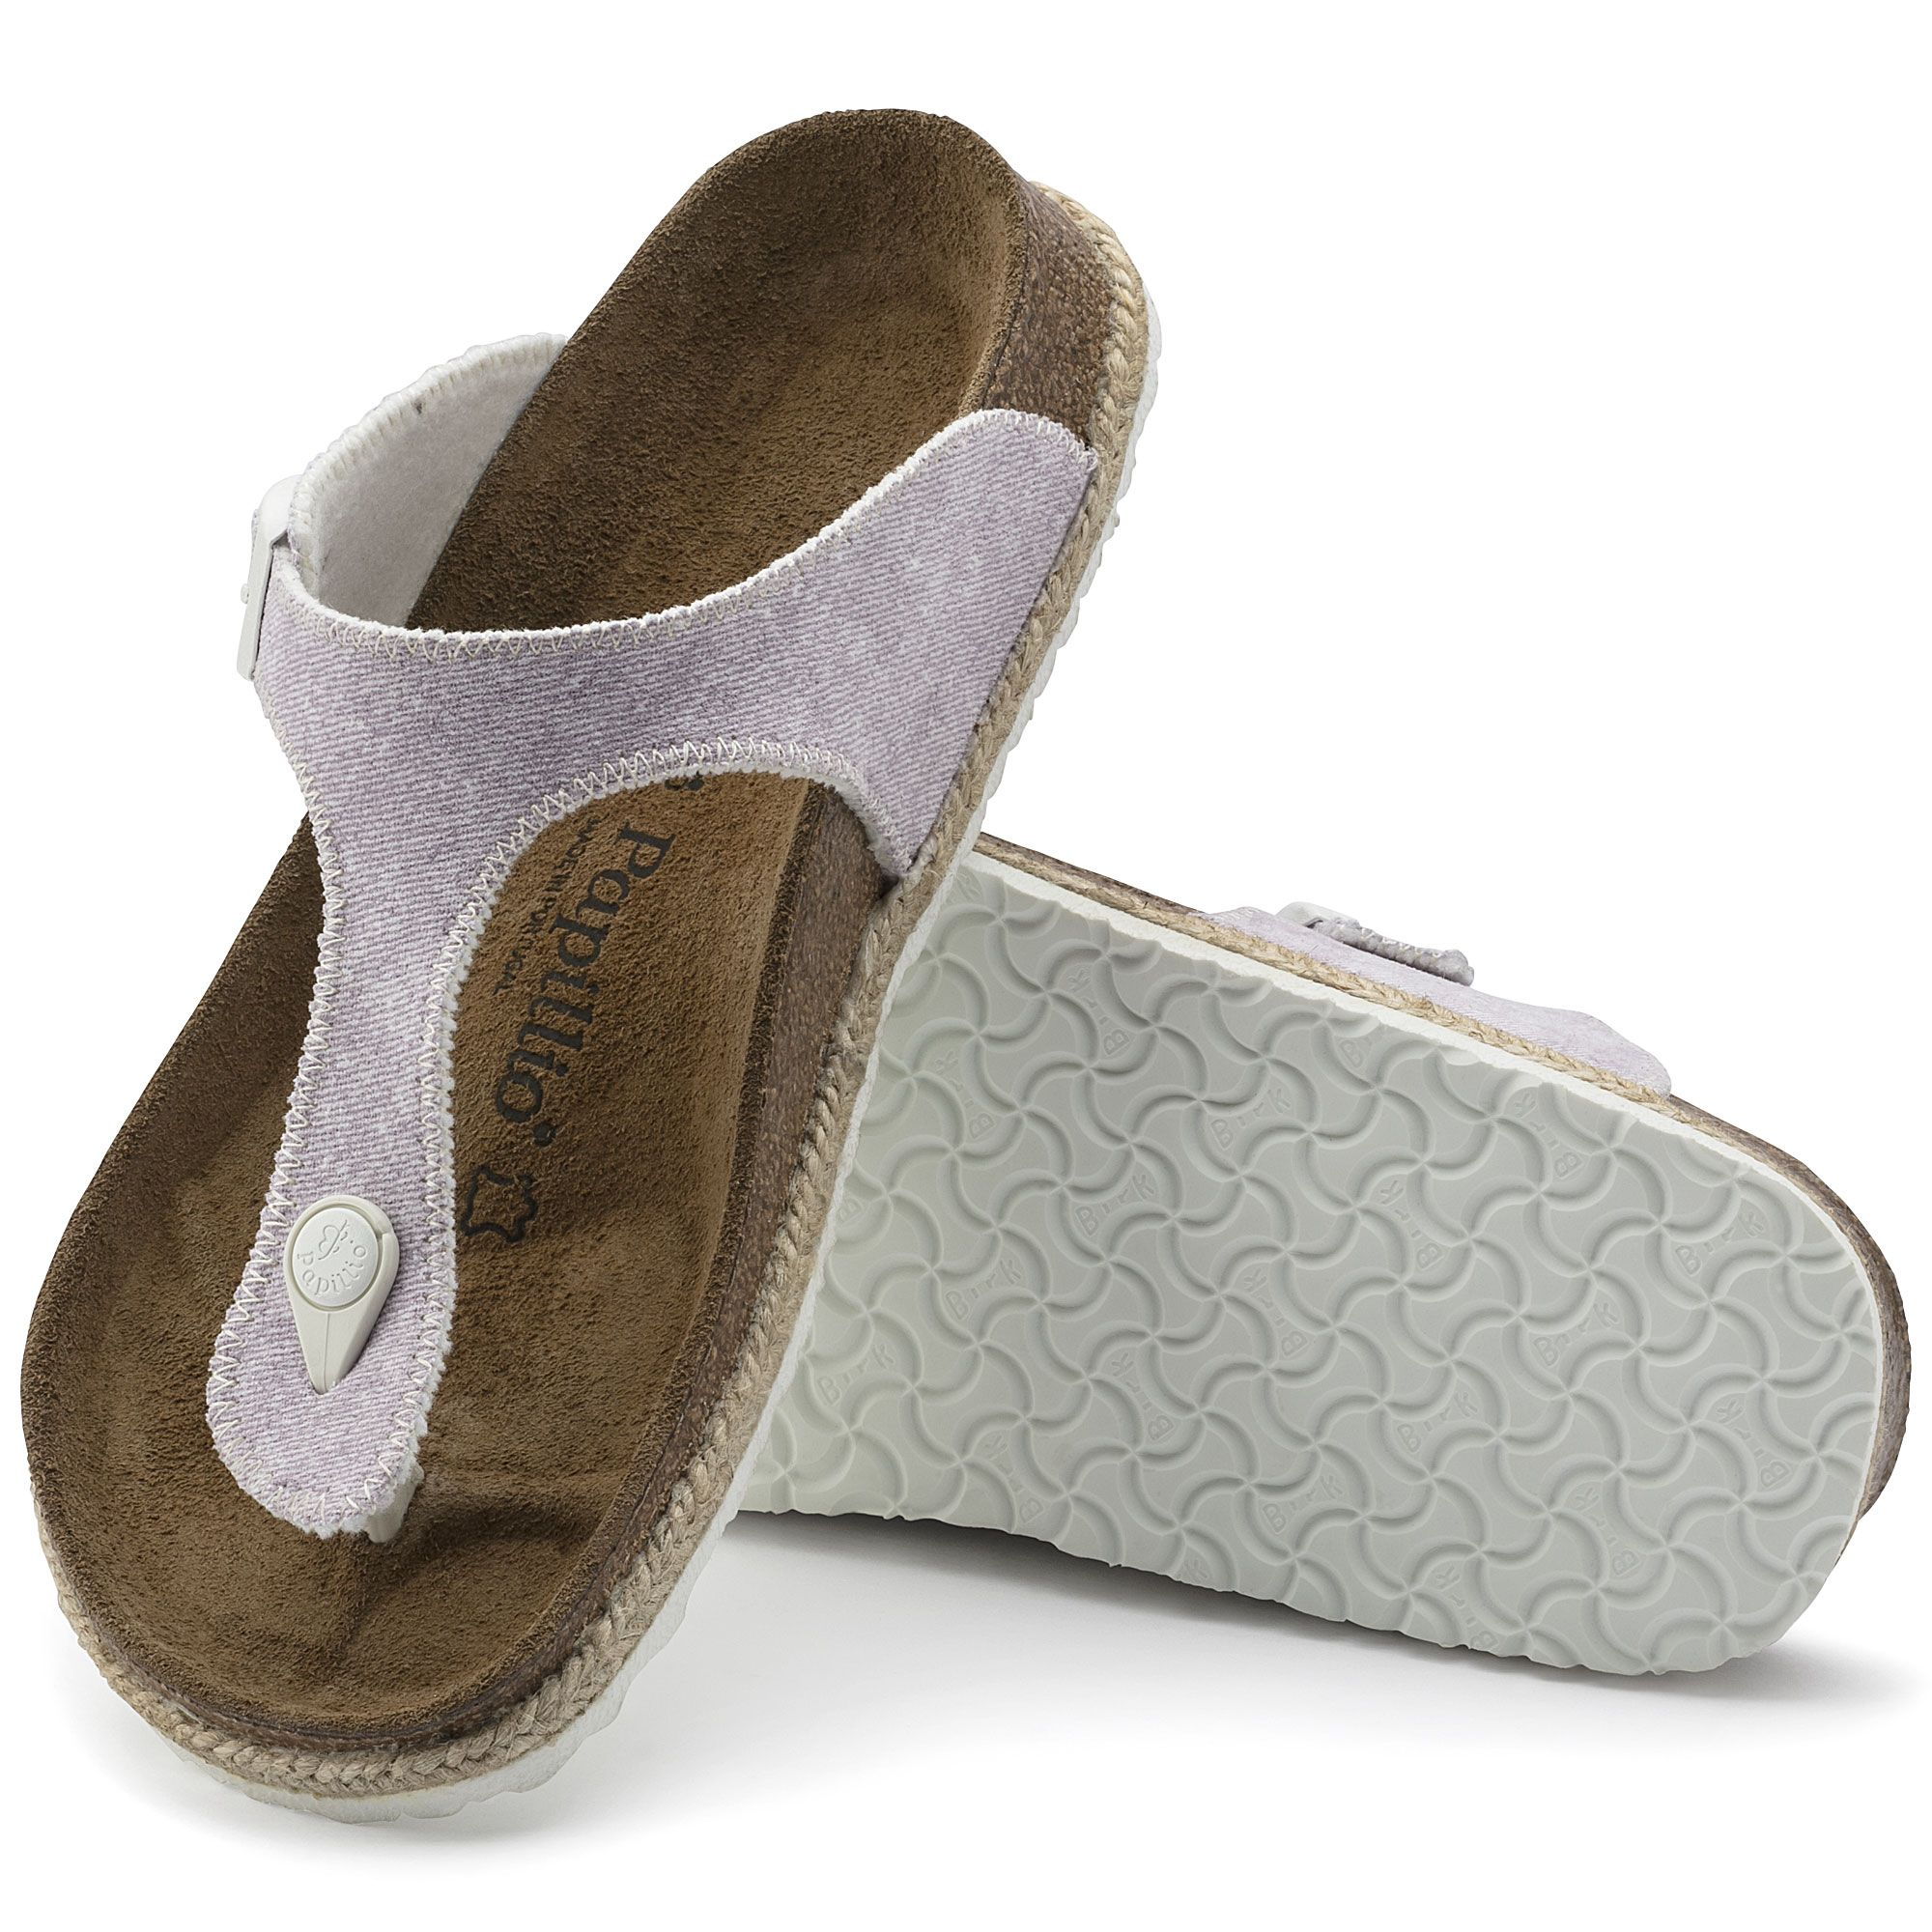 Gizeh Beach Purple Textile   If the shoe fits